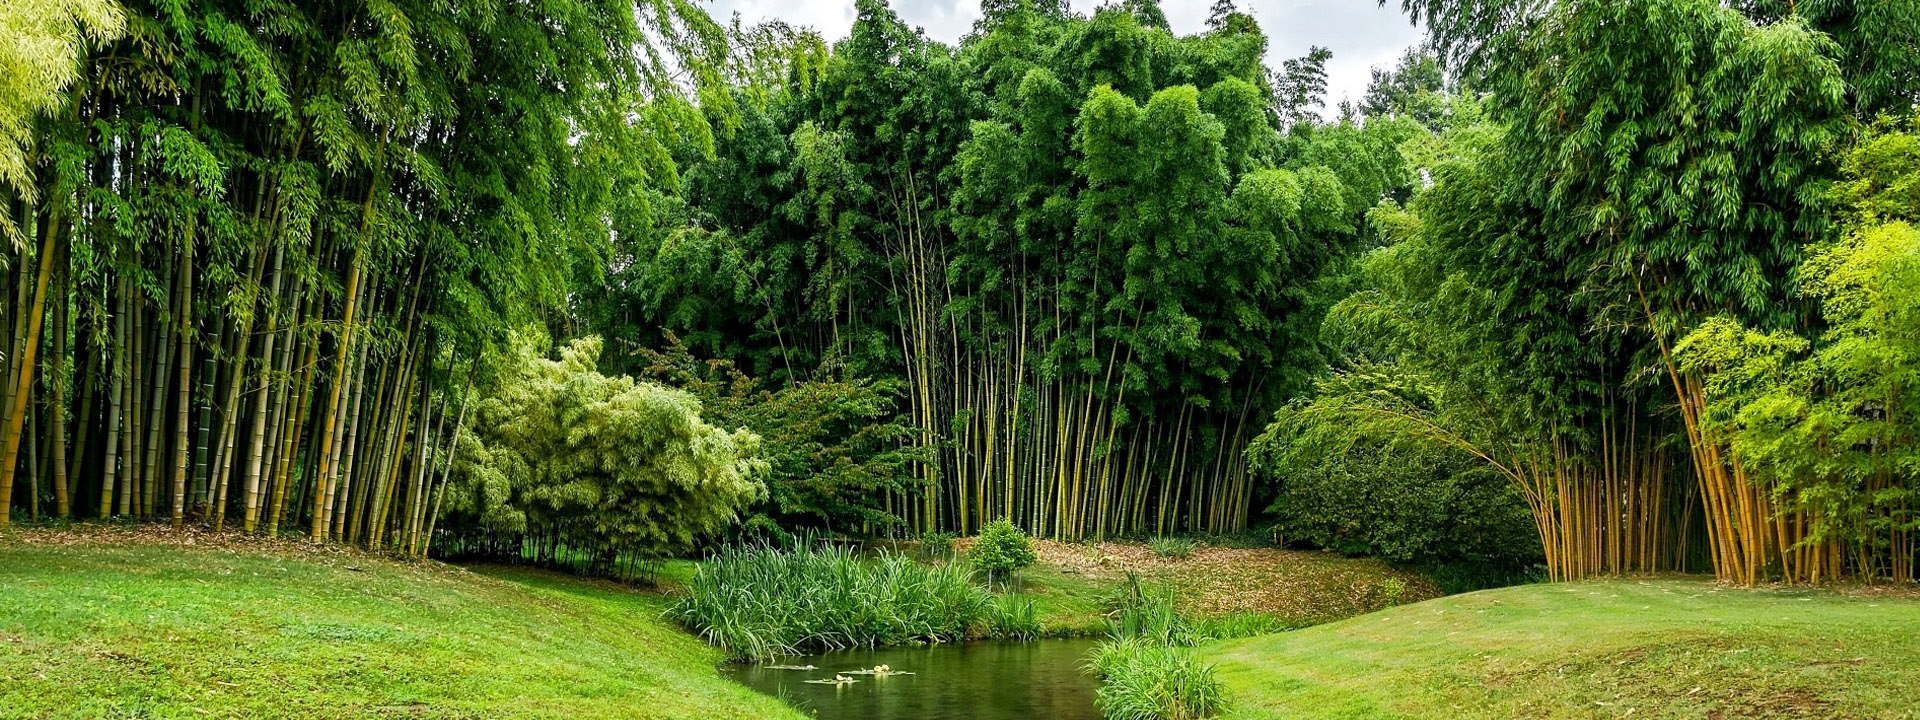 bambus-slider-2